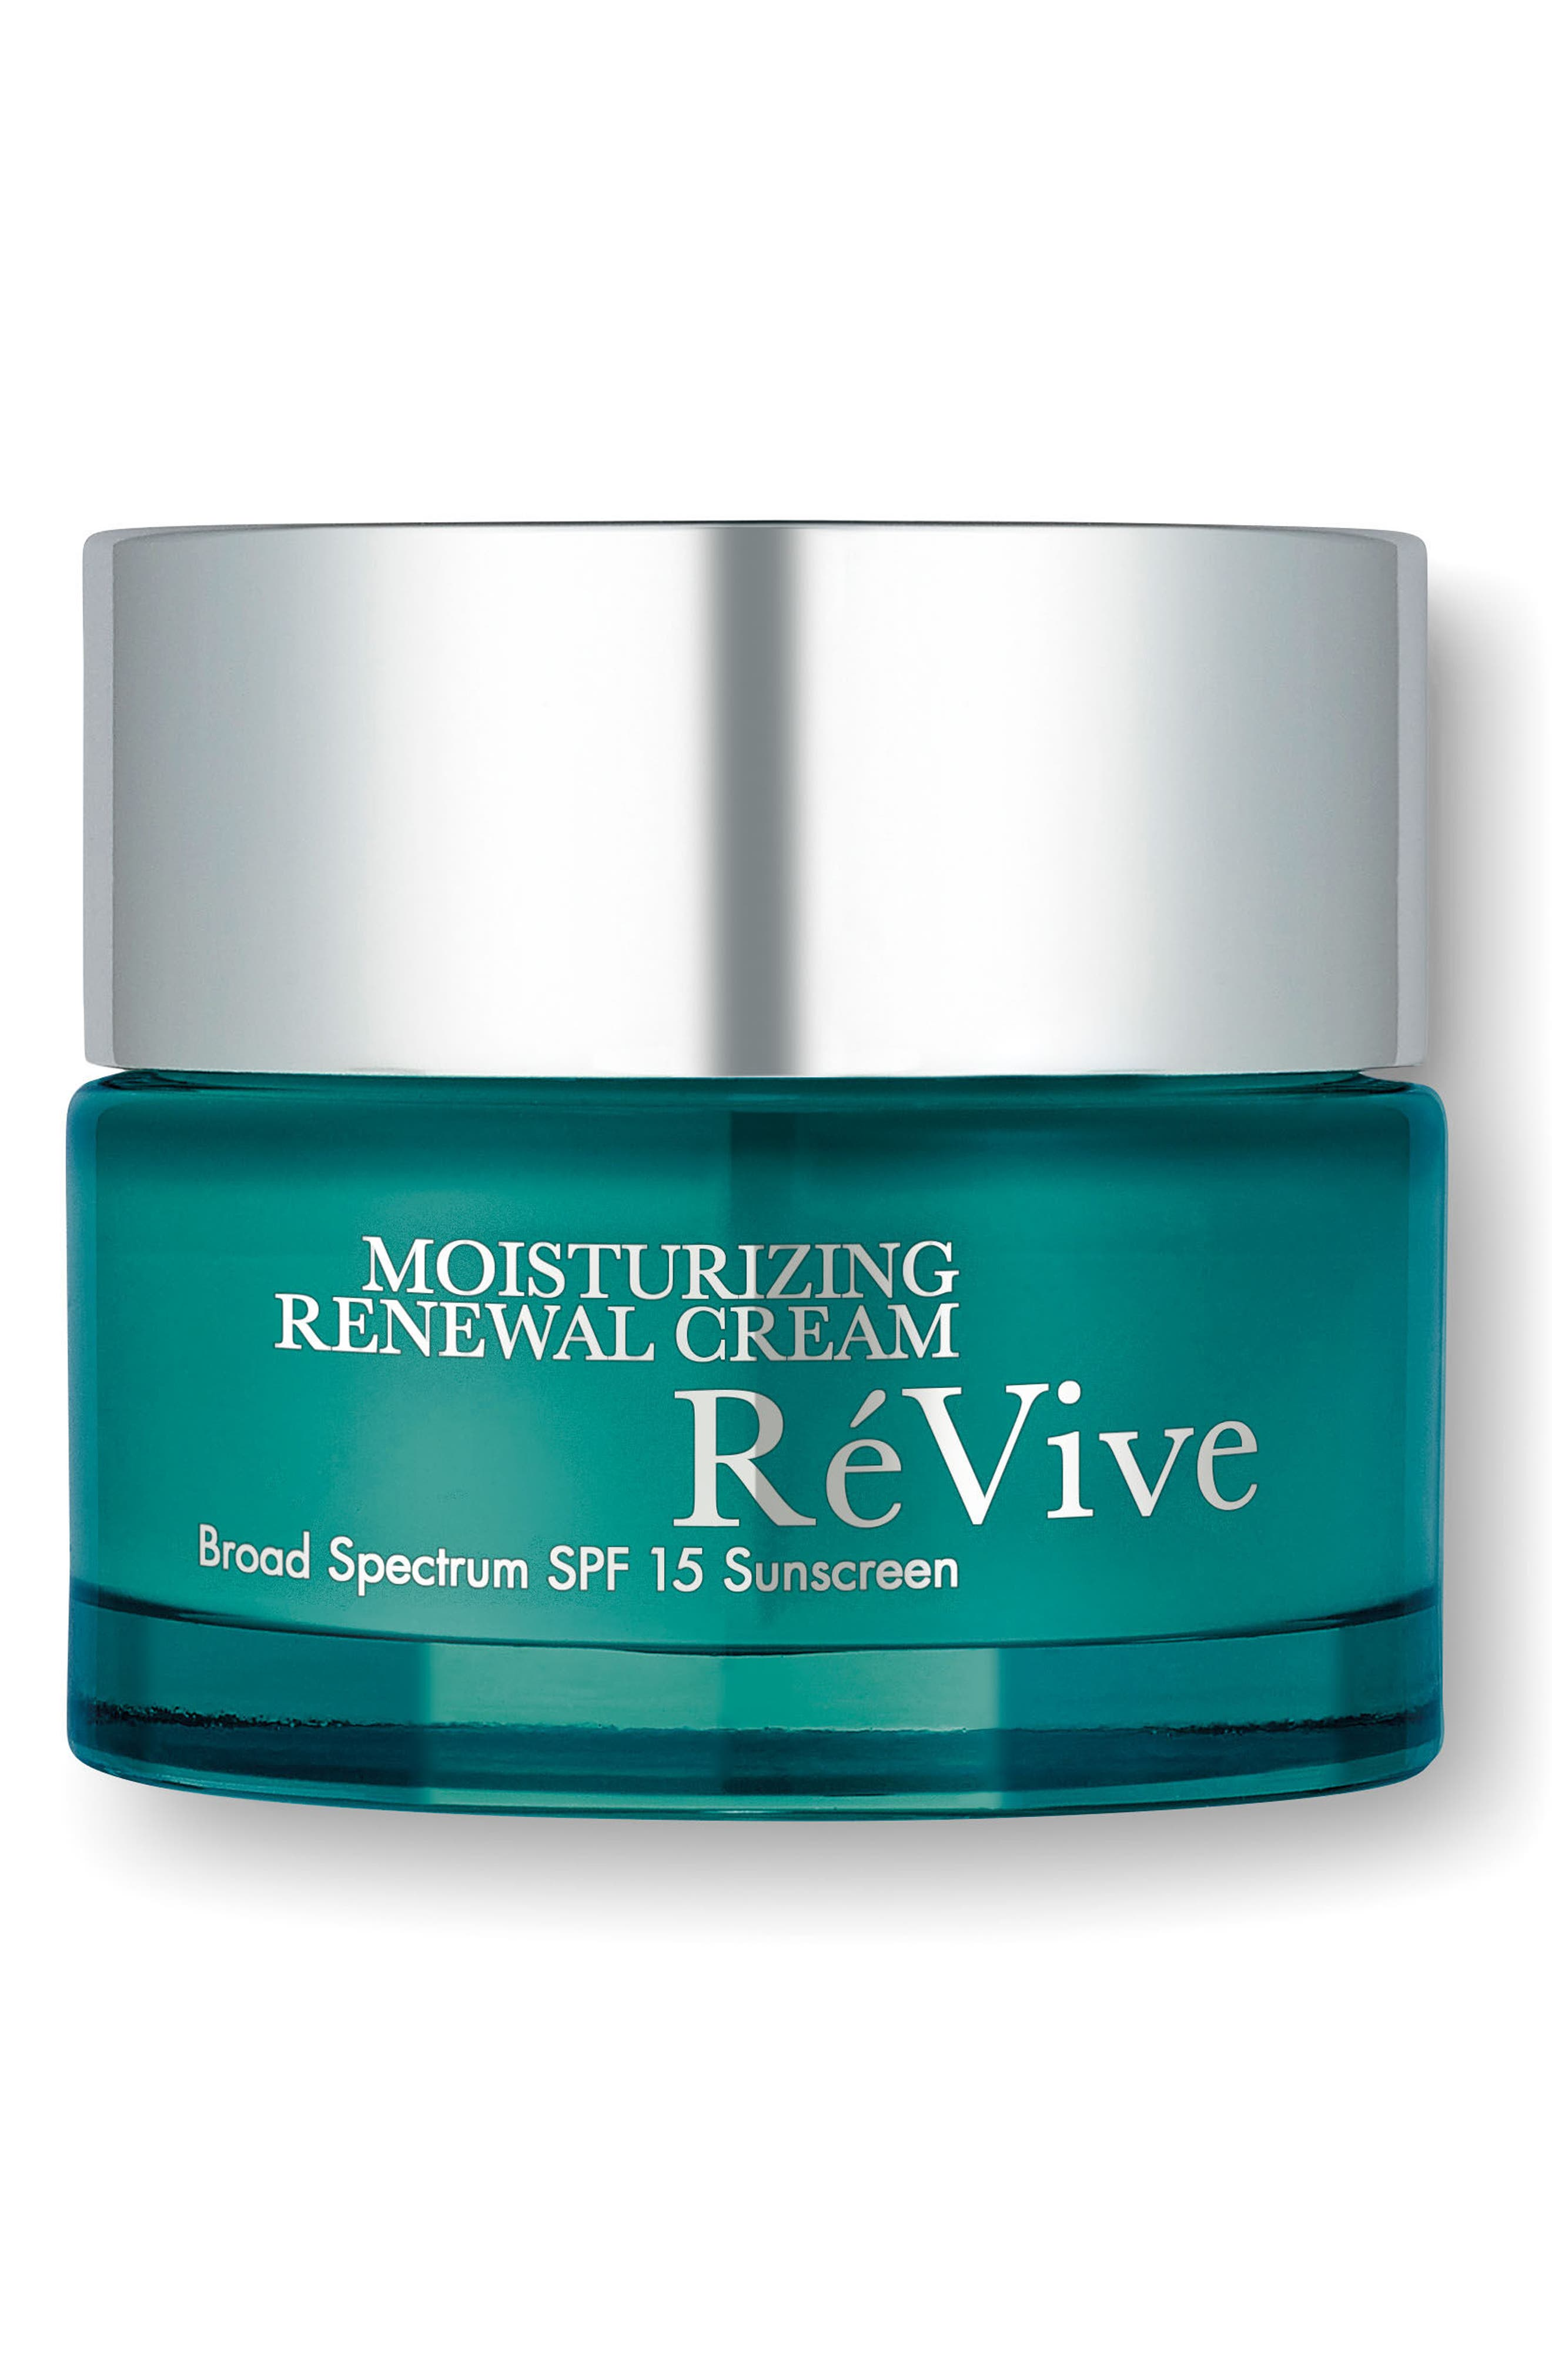 Moisturizing Renewal Cream Broad Spectrum SPF 15 Sunscreen,                             Main thumbnail 1, color,                             None